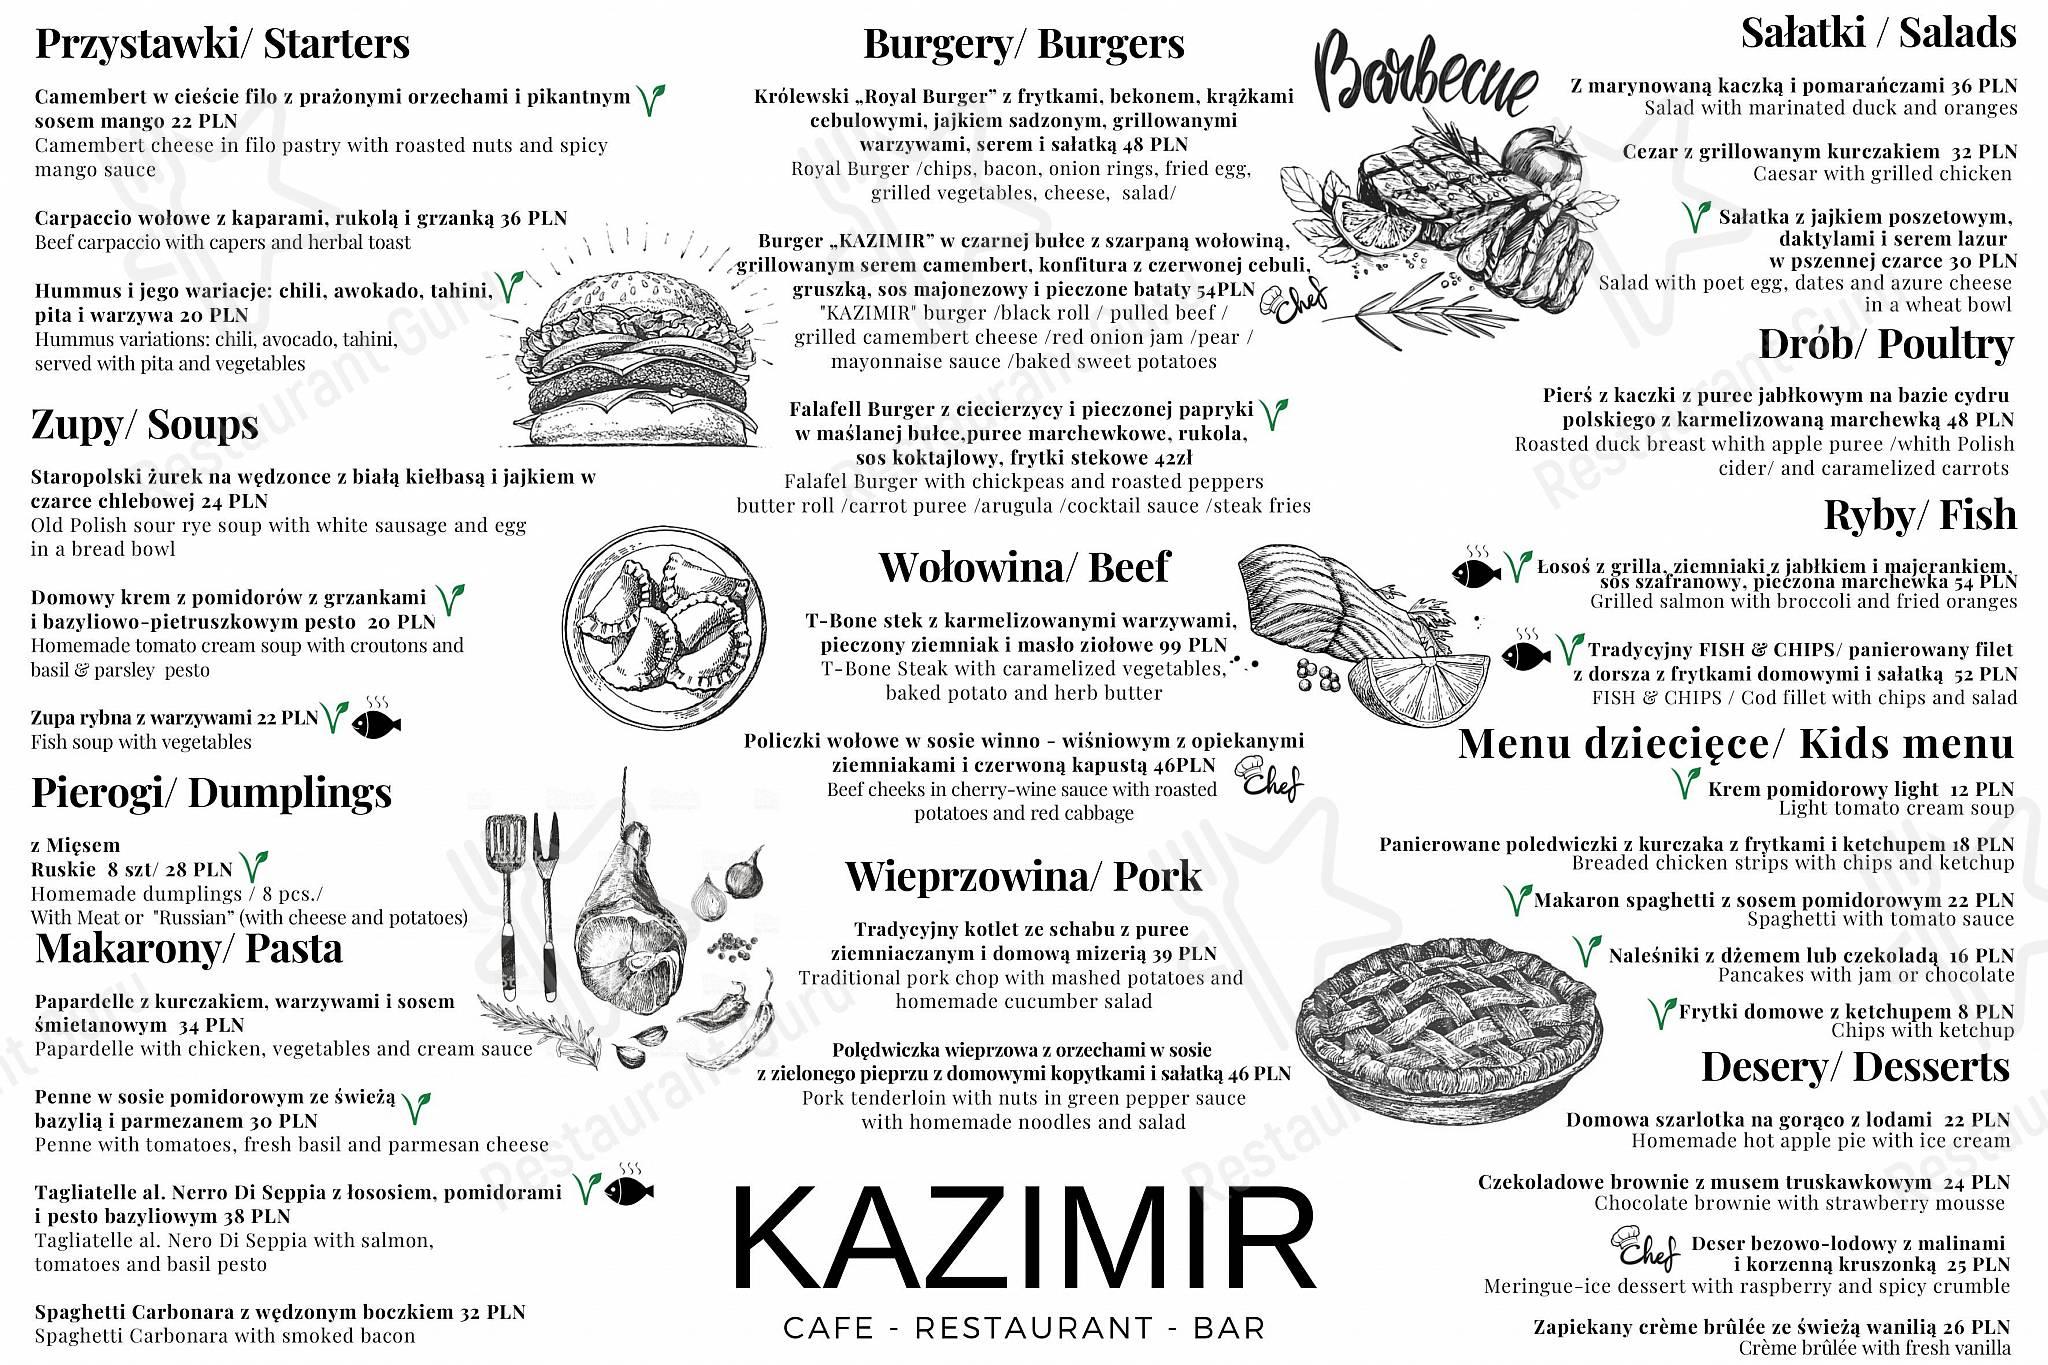 Menu At Kazimir Restaurant Krakow